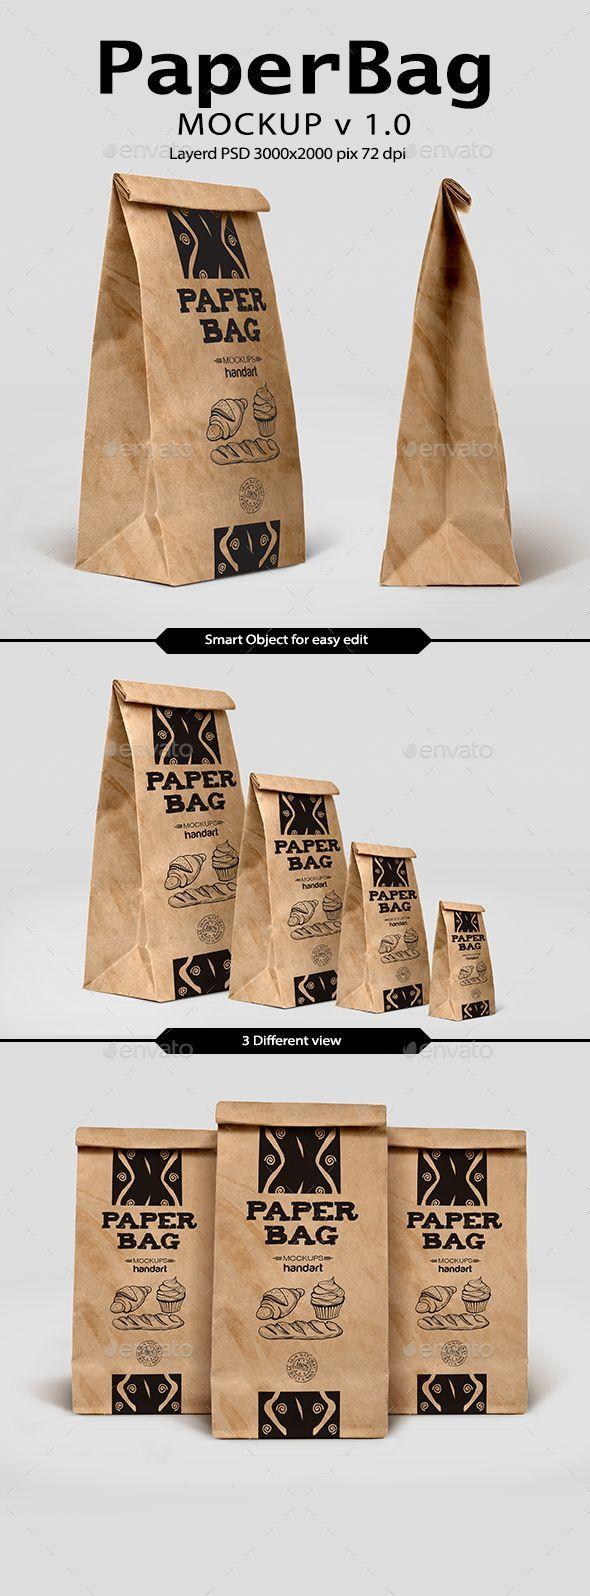 Download Paper Bag Mockup 1 0 Tea Packaging Design Bag Mockup Paper Packaging